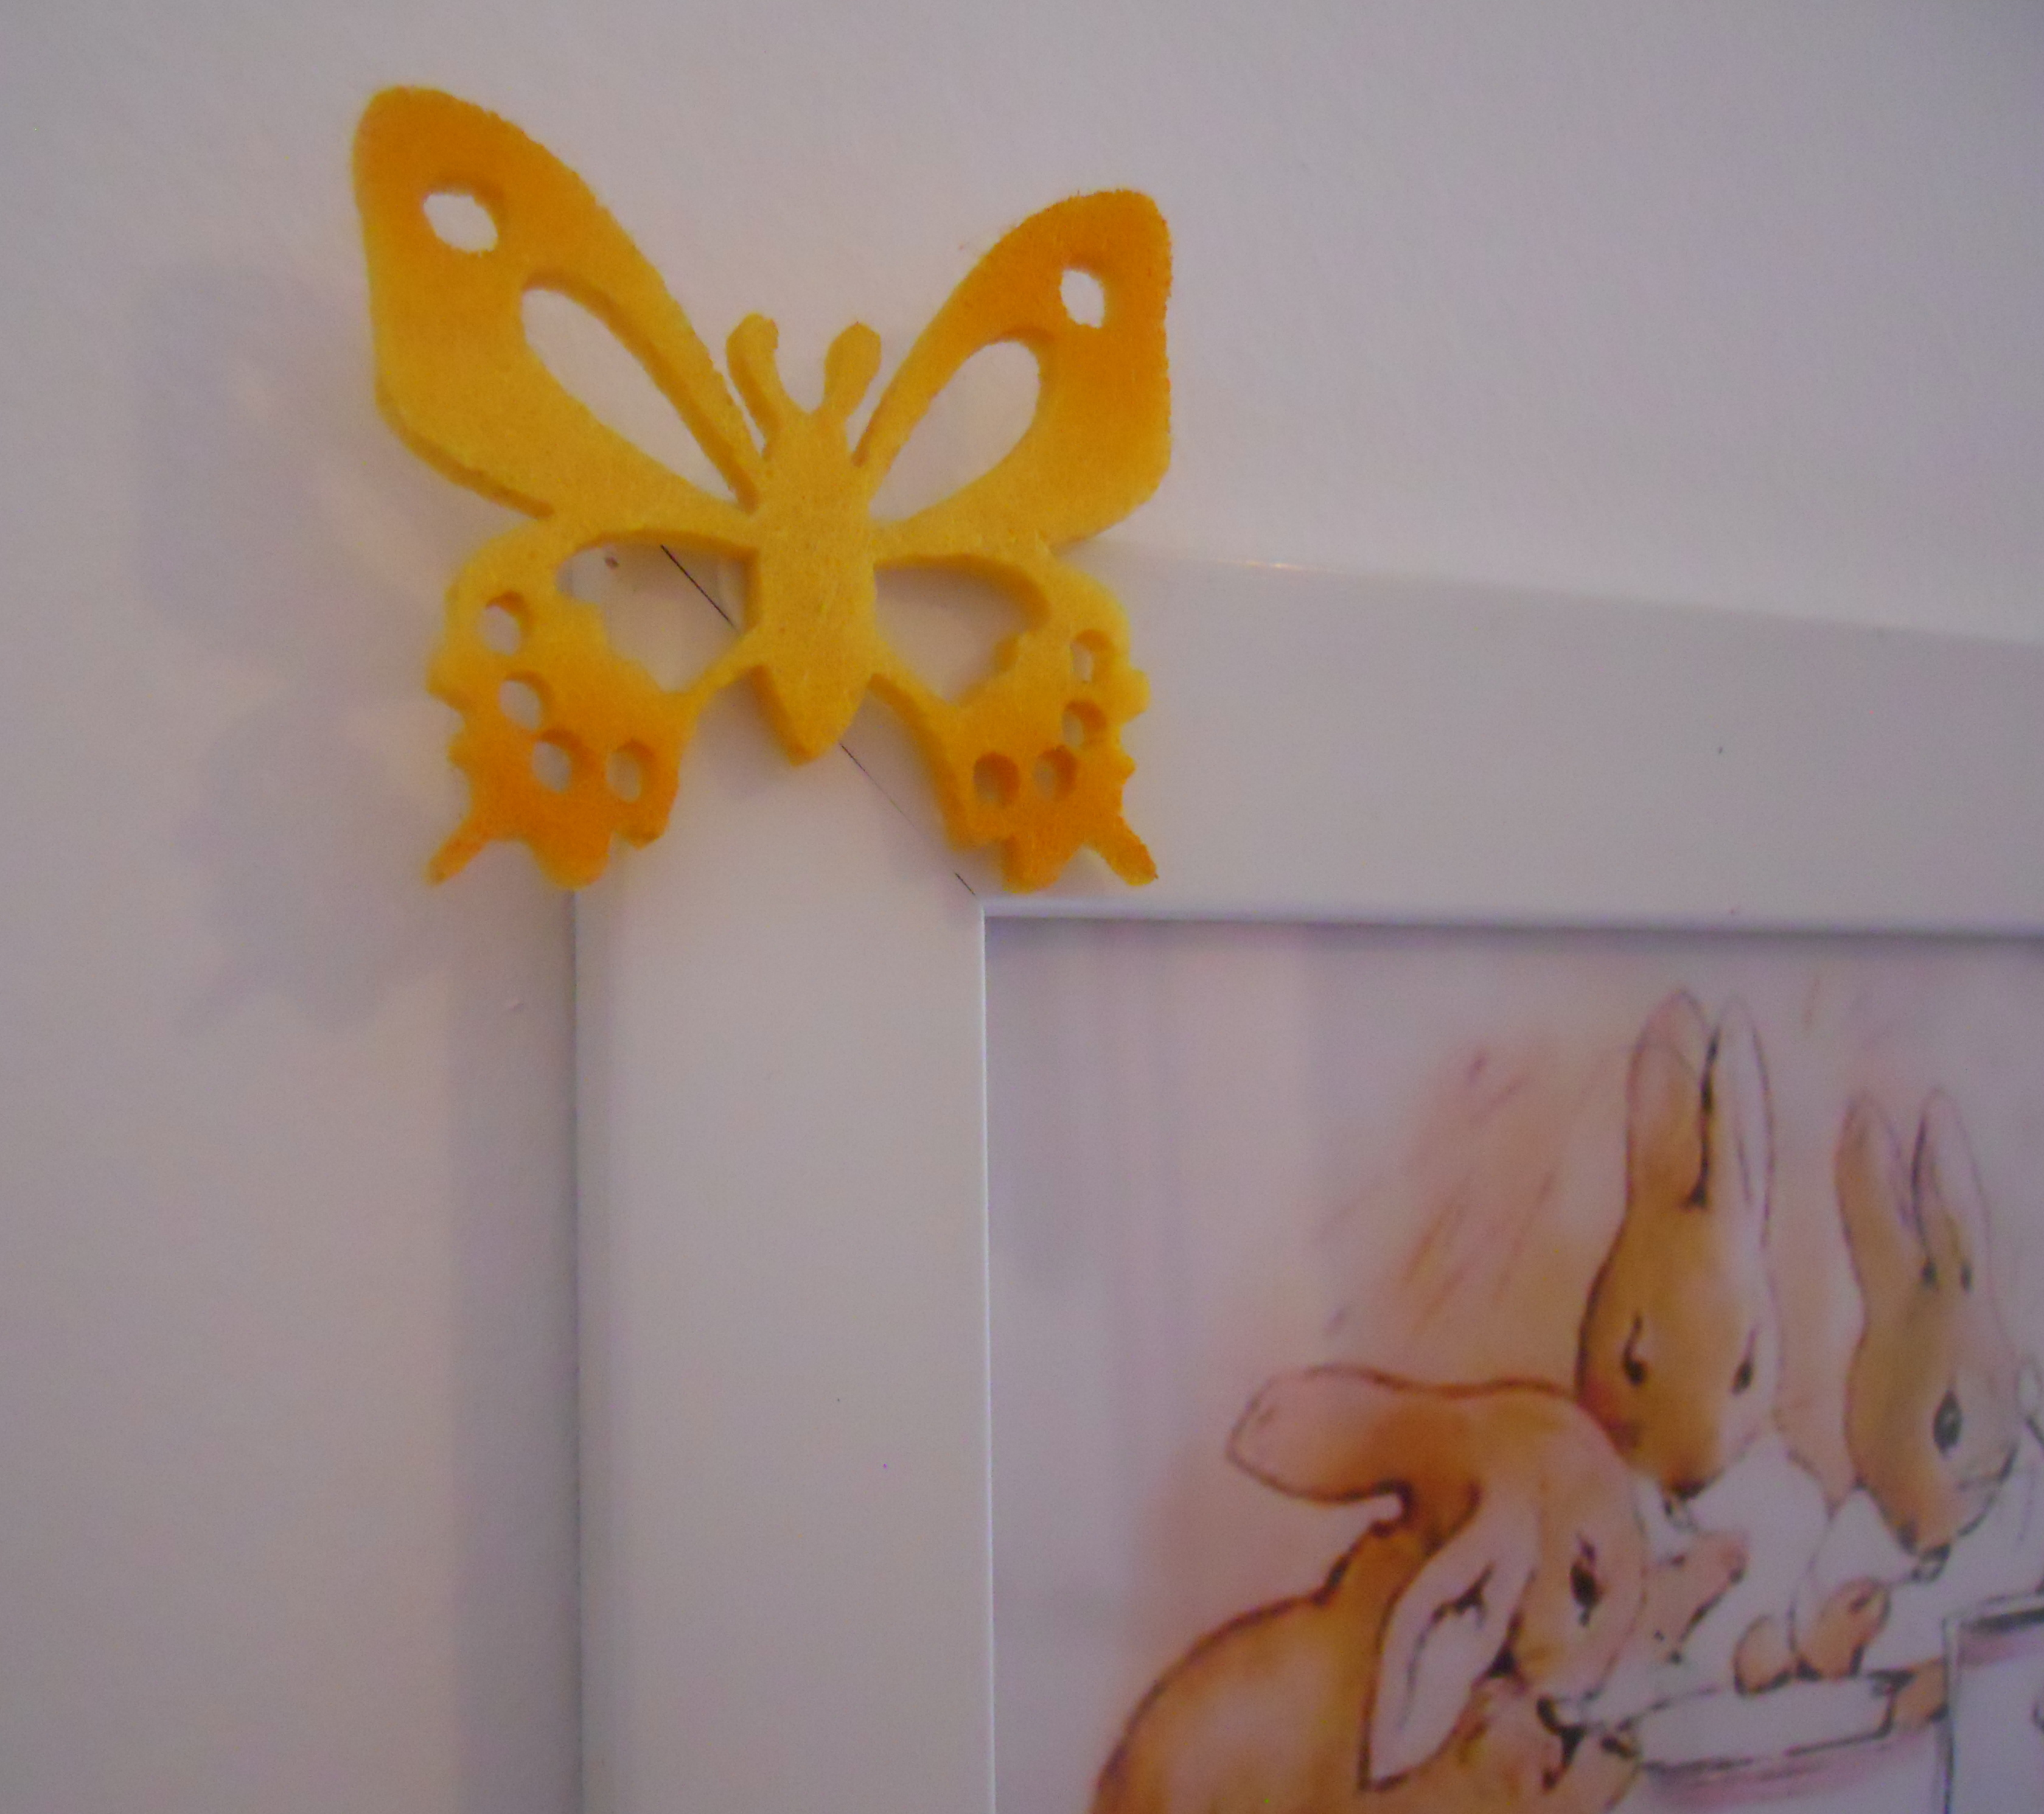 Lampadario farfalle fai da te lampadario farfalle fai da te archives ve lo raccomangio - Ikea lampadario bambini ...